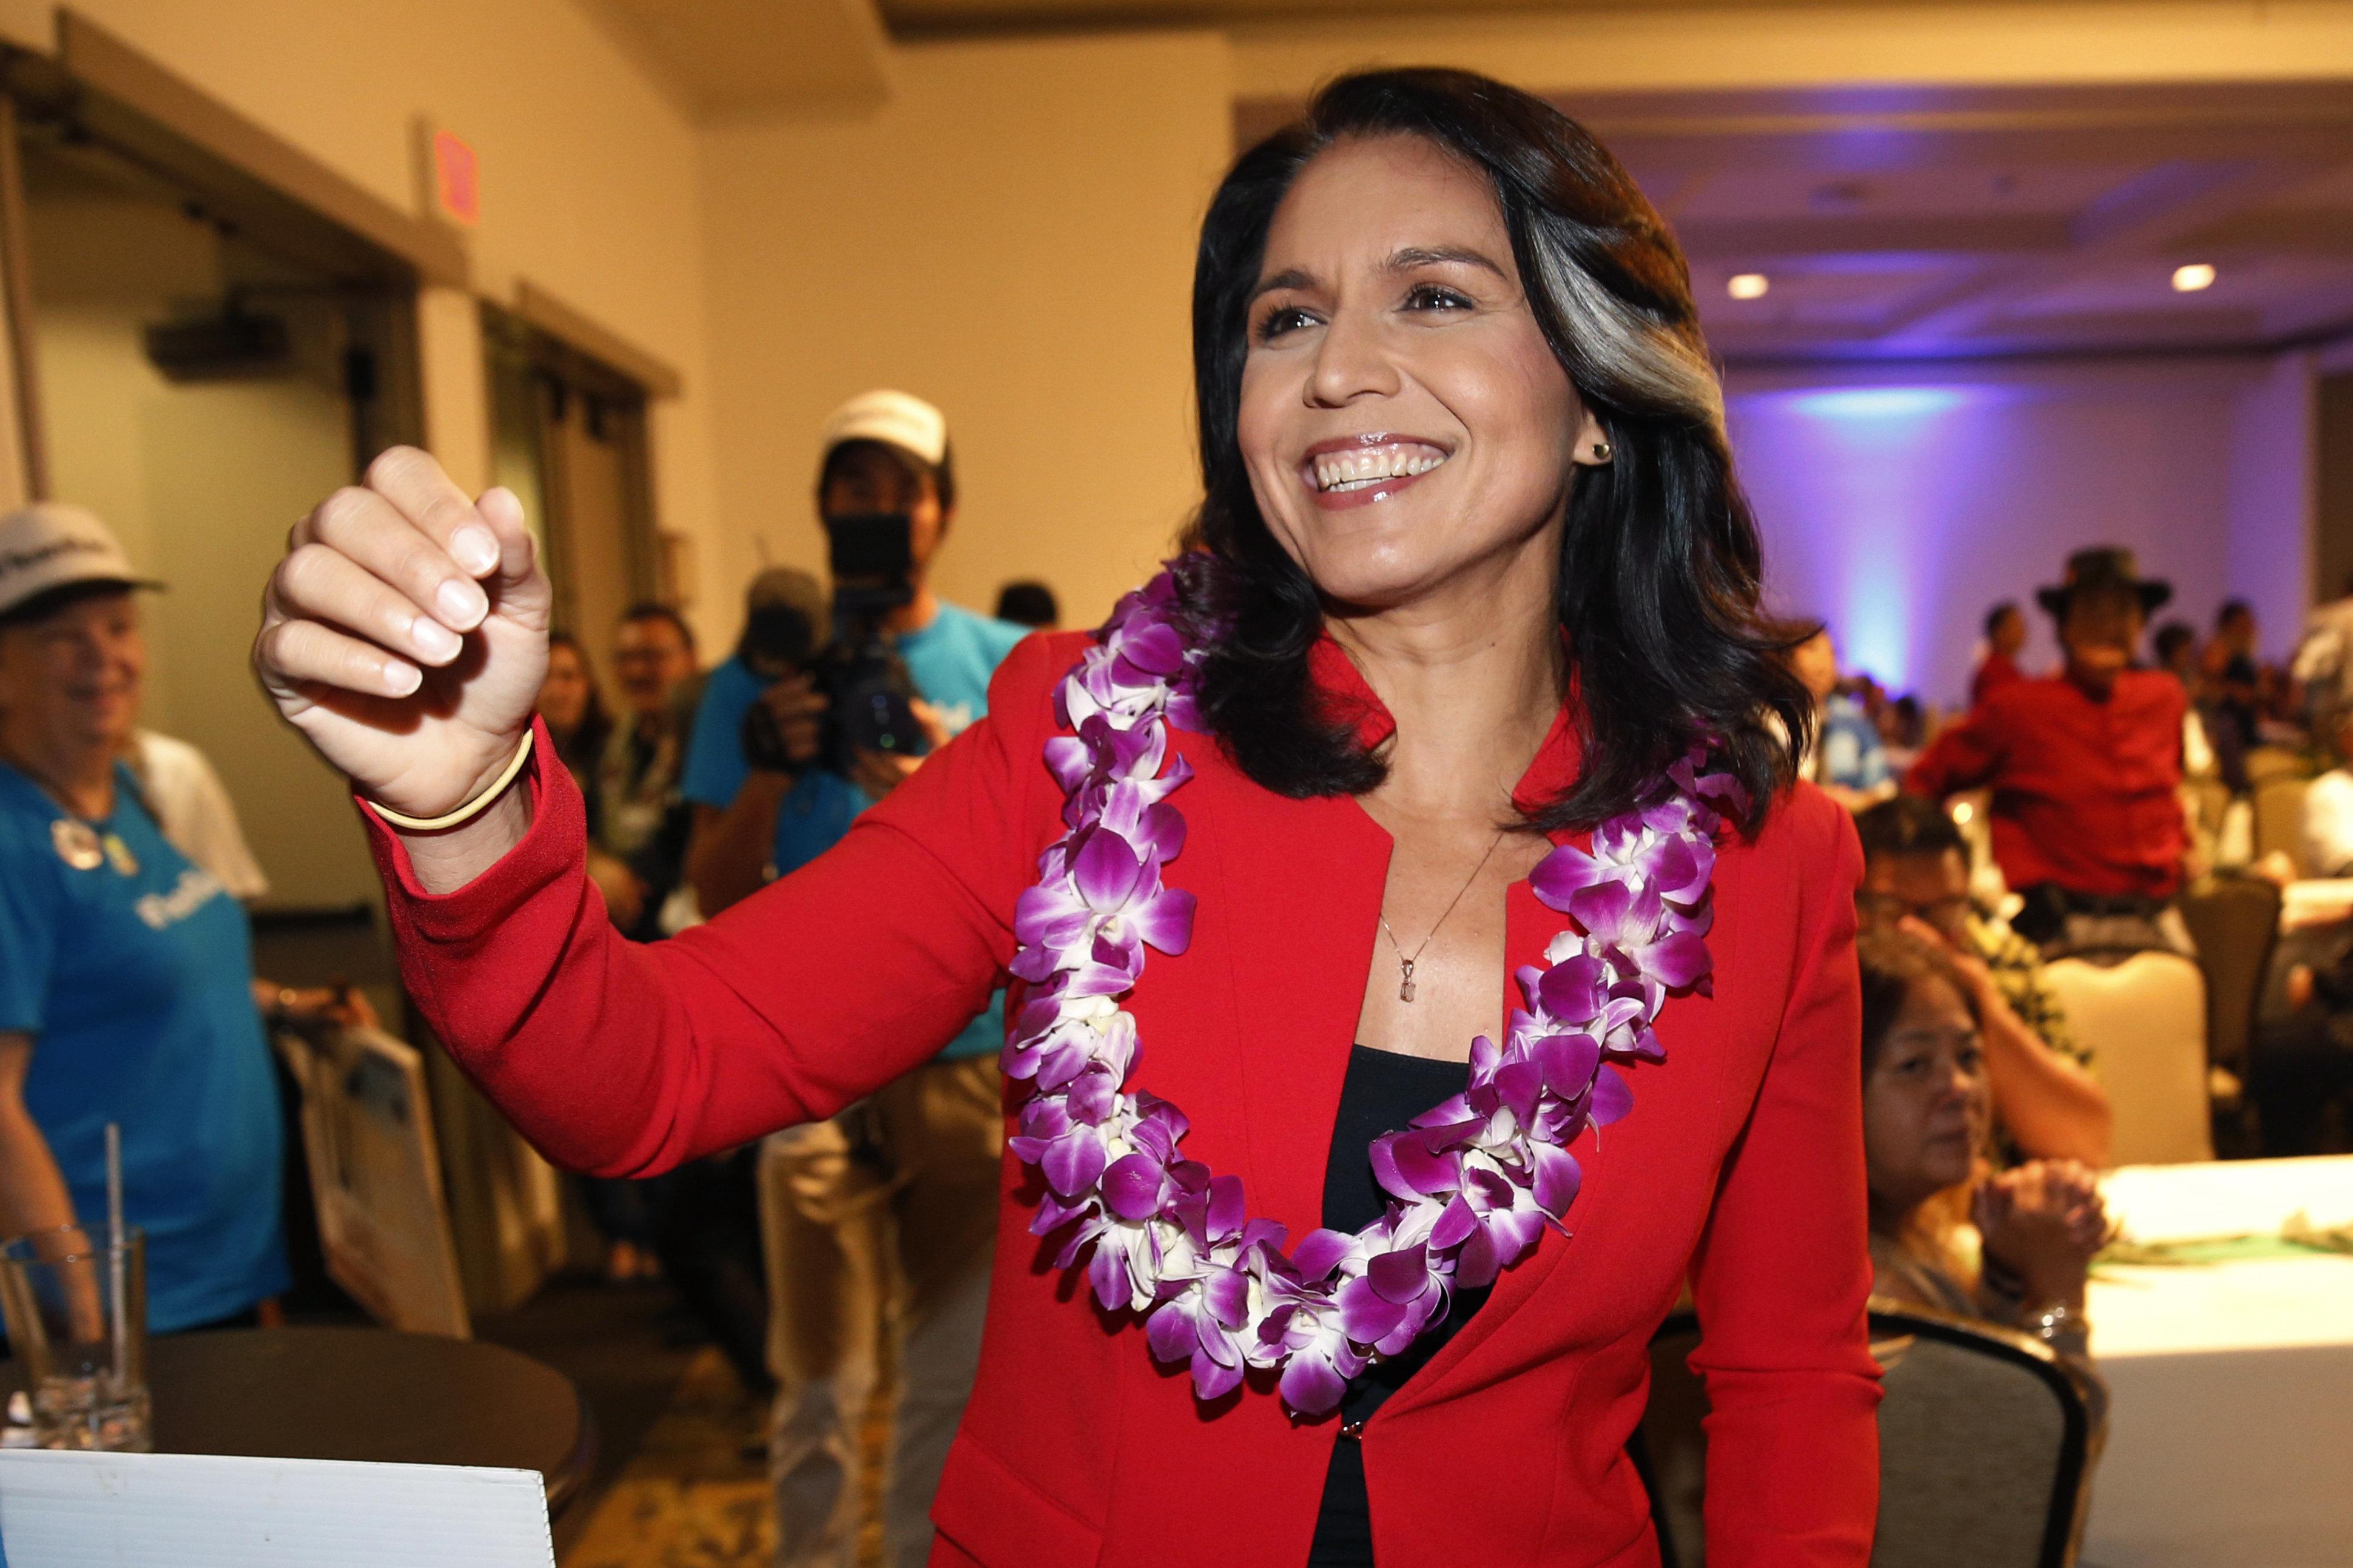 Rep. Tulsi Gabbardis pitching herself as Democrats' top anti-war voice and a serious progressive...